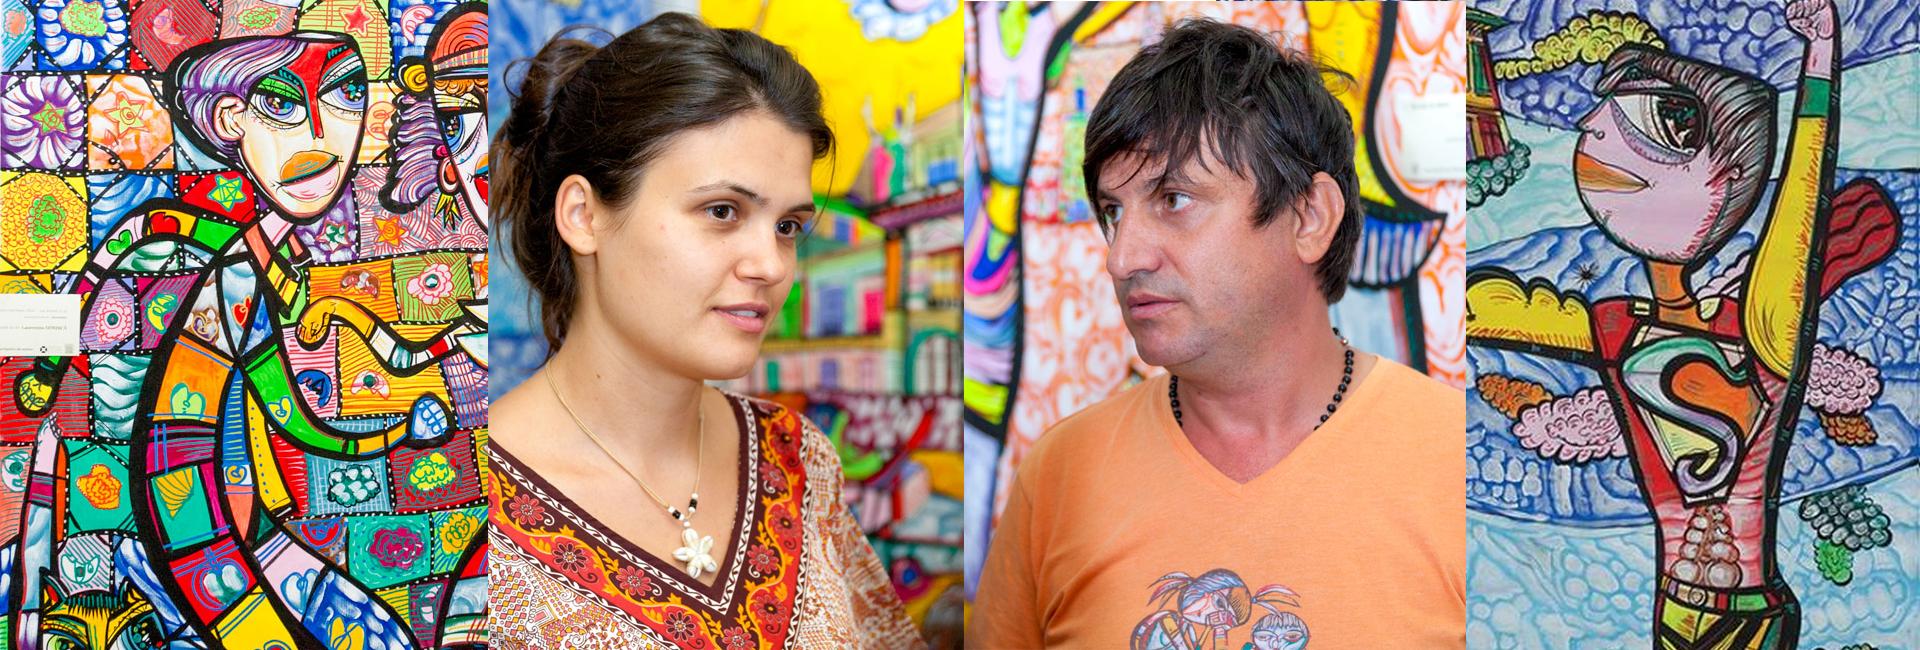 Interviu-Arina-Rusu-Laurentiu-Dimisca-Matricea-Romaneasca